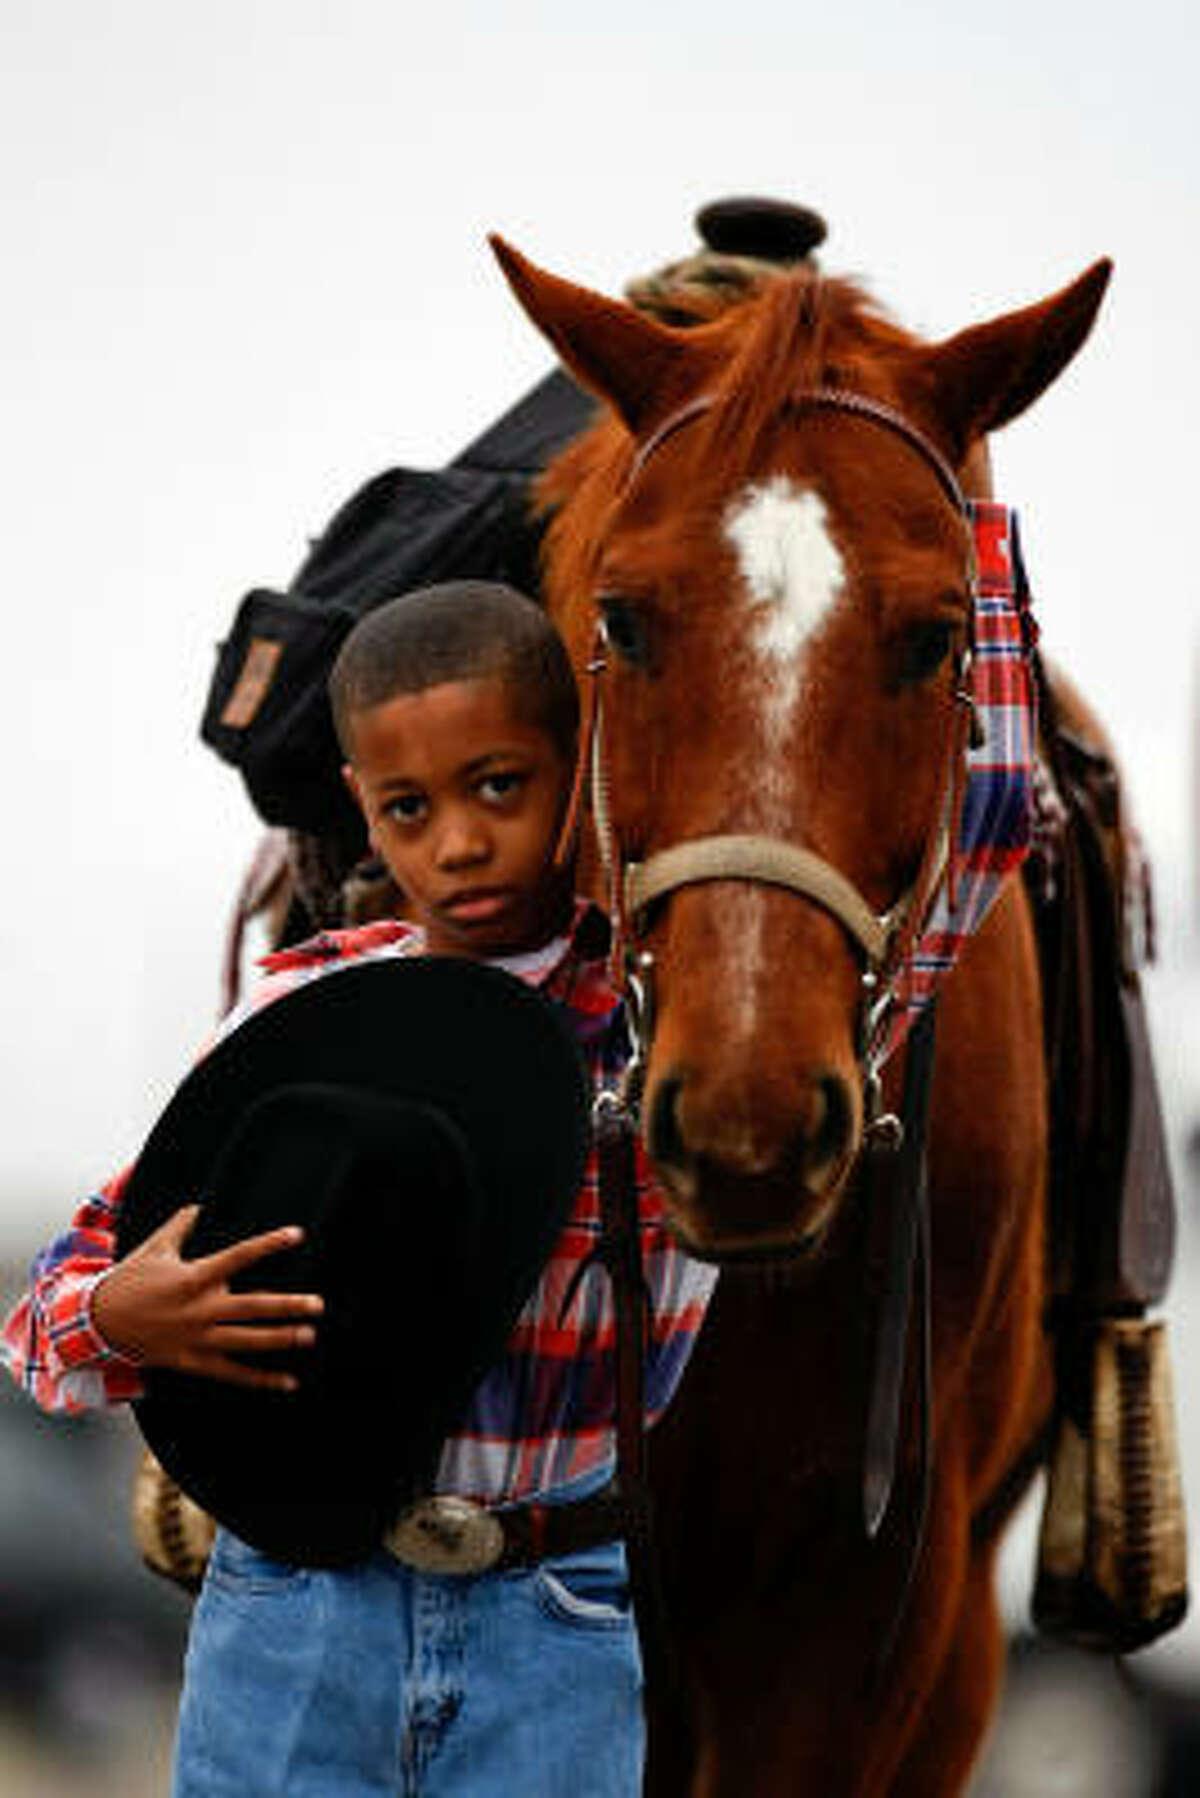 Jordan McClellan, 8, of Houston, holds onto a horse named Starburst before leaving the Fort Bend County Fairgrounds in Rosenberg to join the Southwest Trail Ride Association.